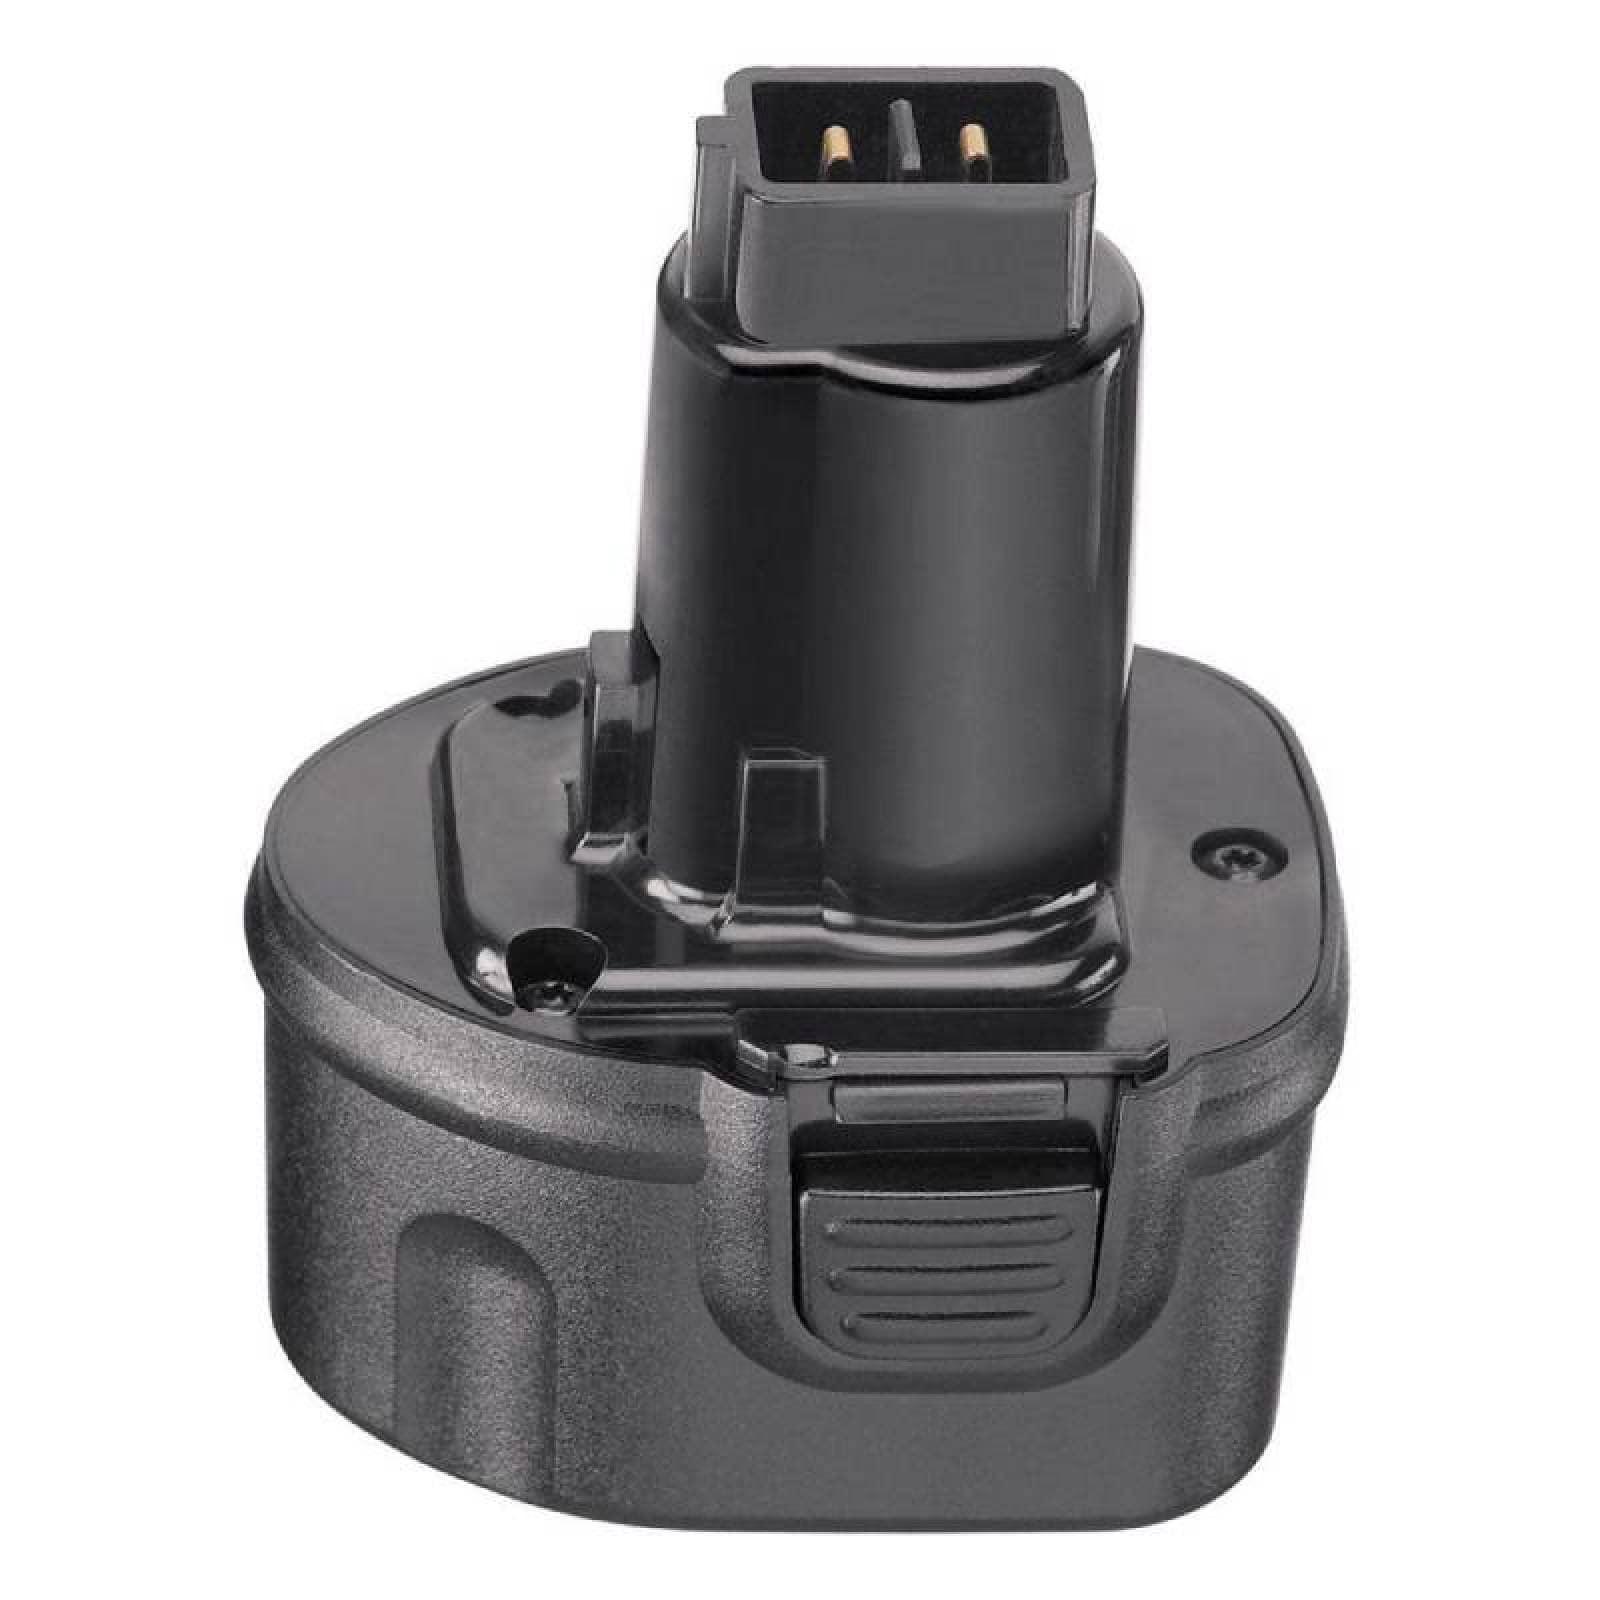 Bateria Niquel 7.2 V Para Herramientas Inalambricas DeWalt